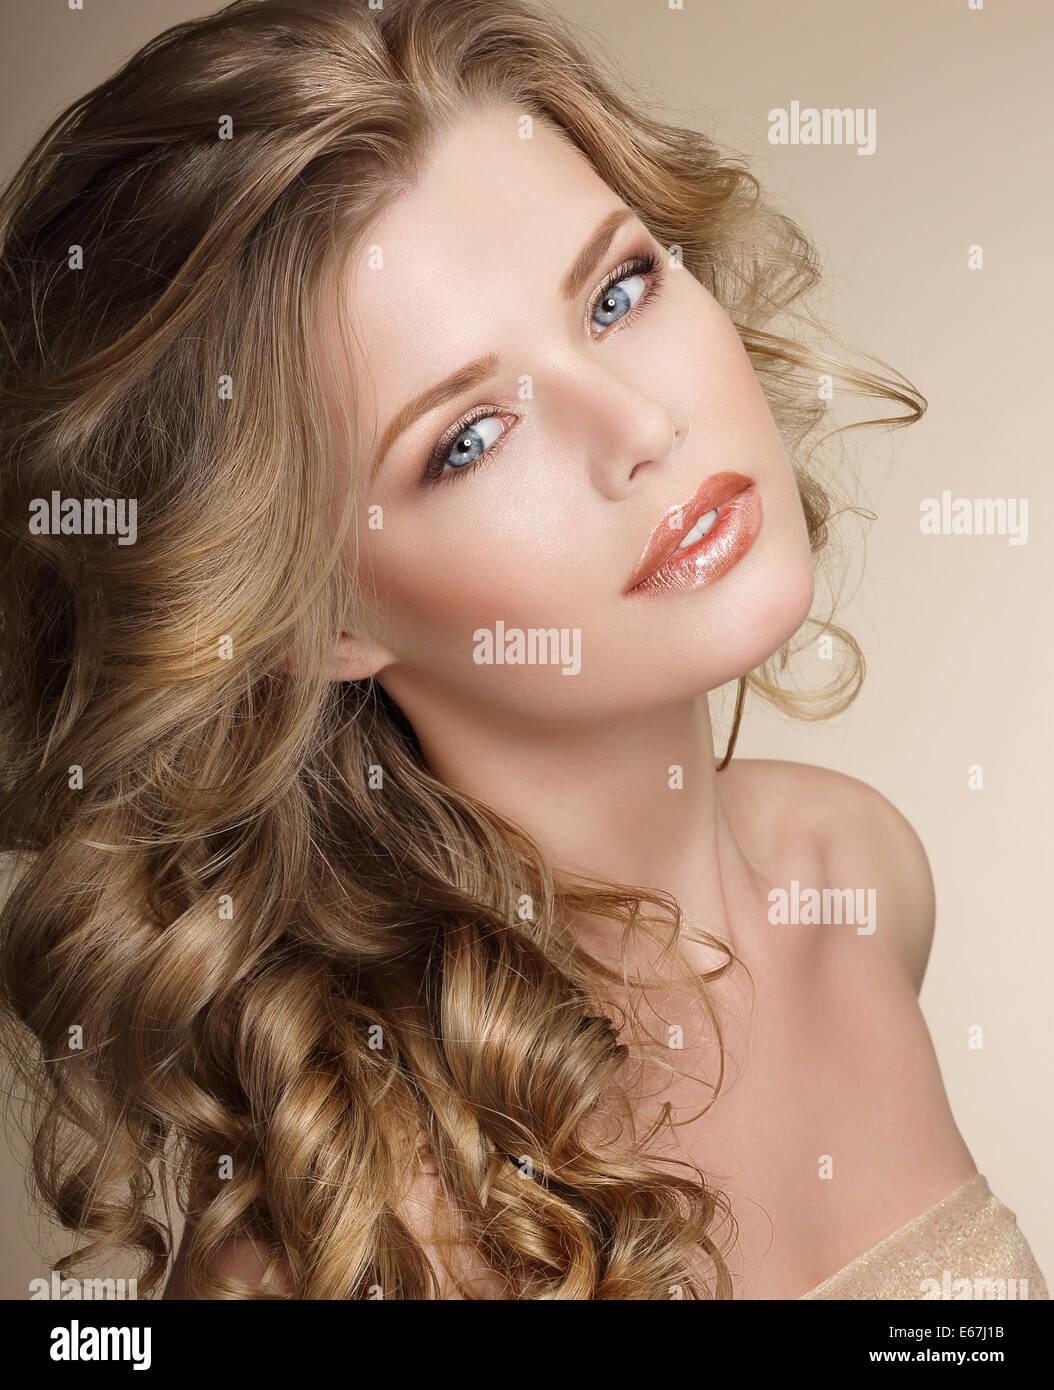 La perfección. Preciosa hembra con Frizzy cabello sano Cenicienta Imagen De Stock